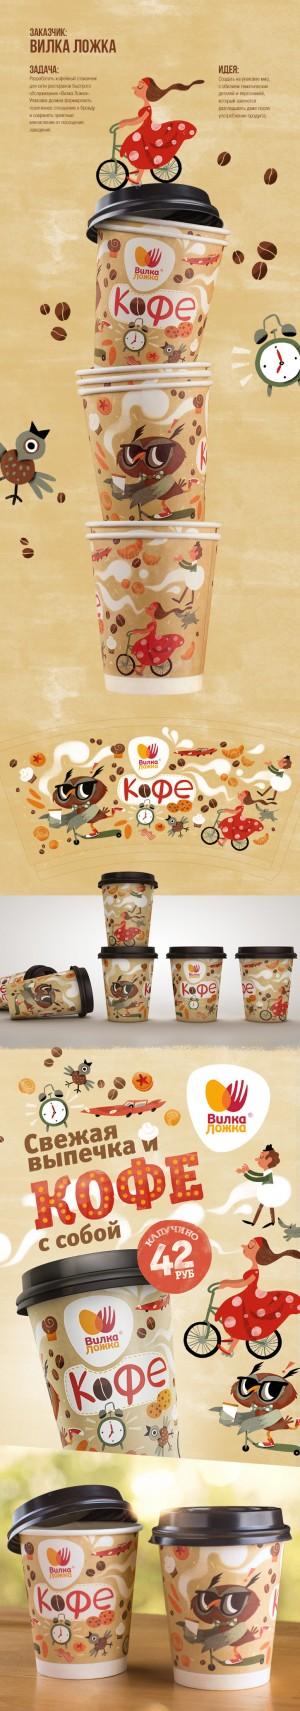 Coffee cup | Glass for coffee